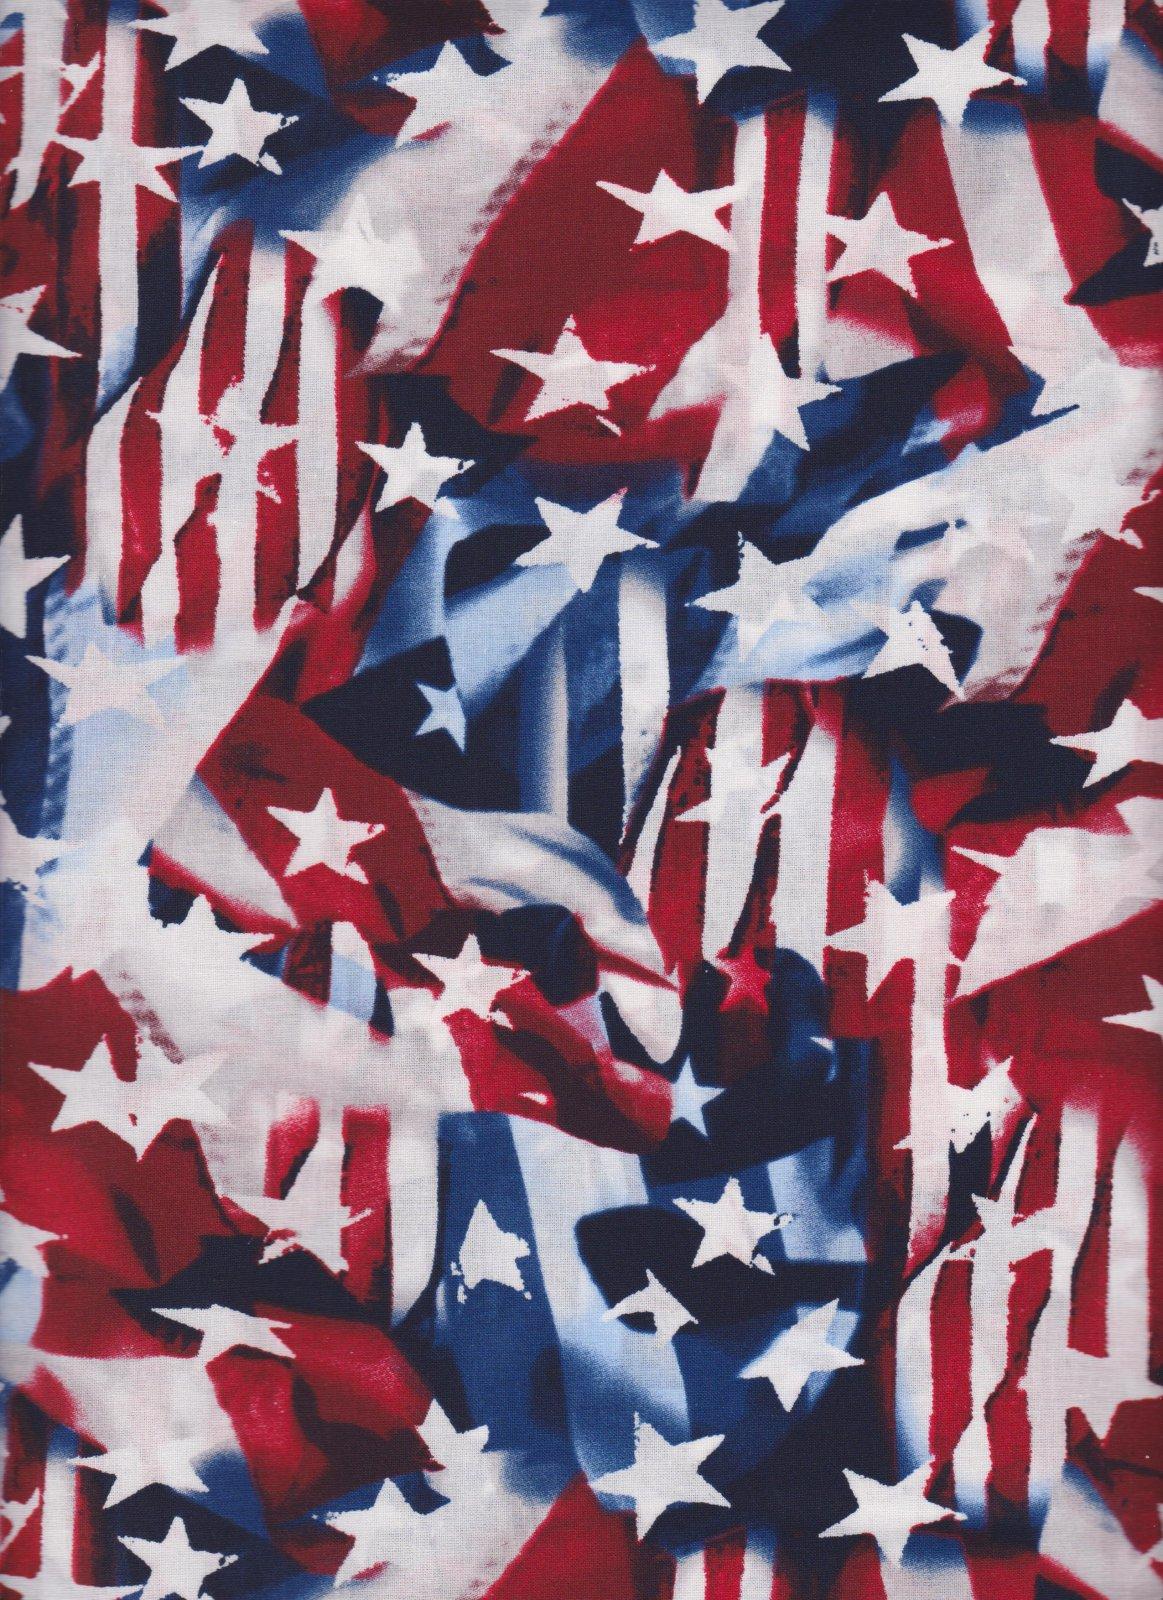 Made in the USA 49024 RWB